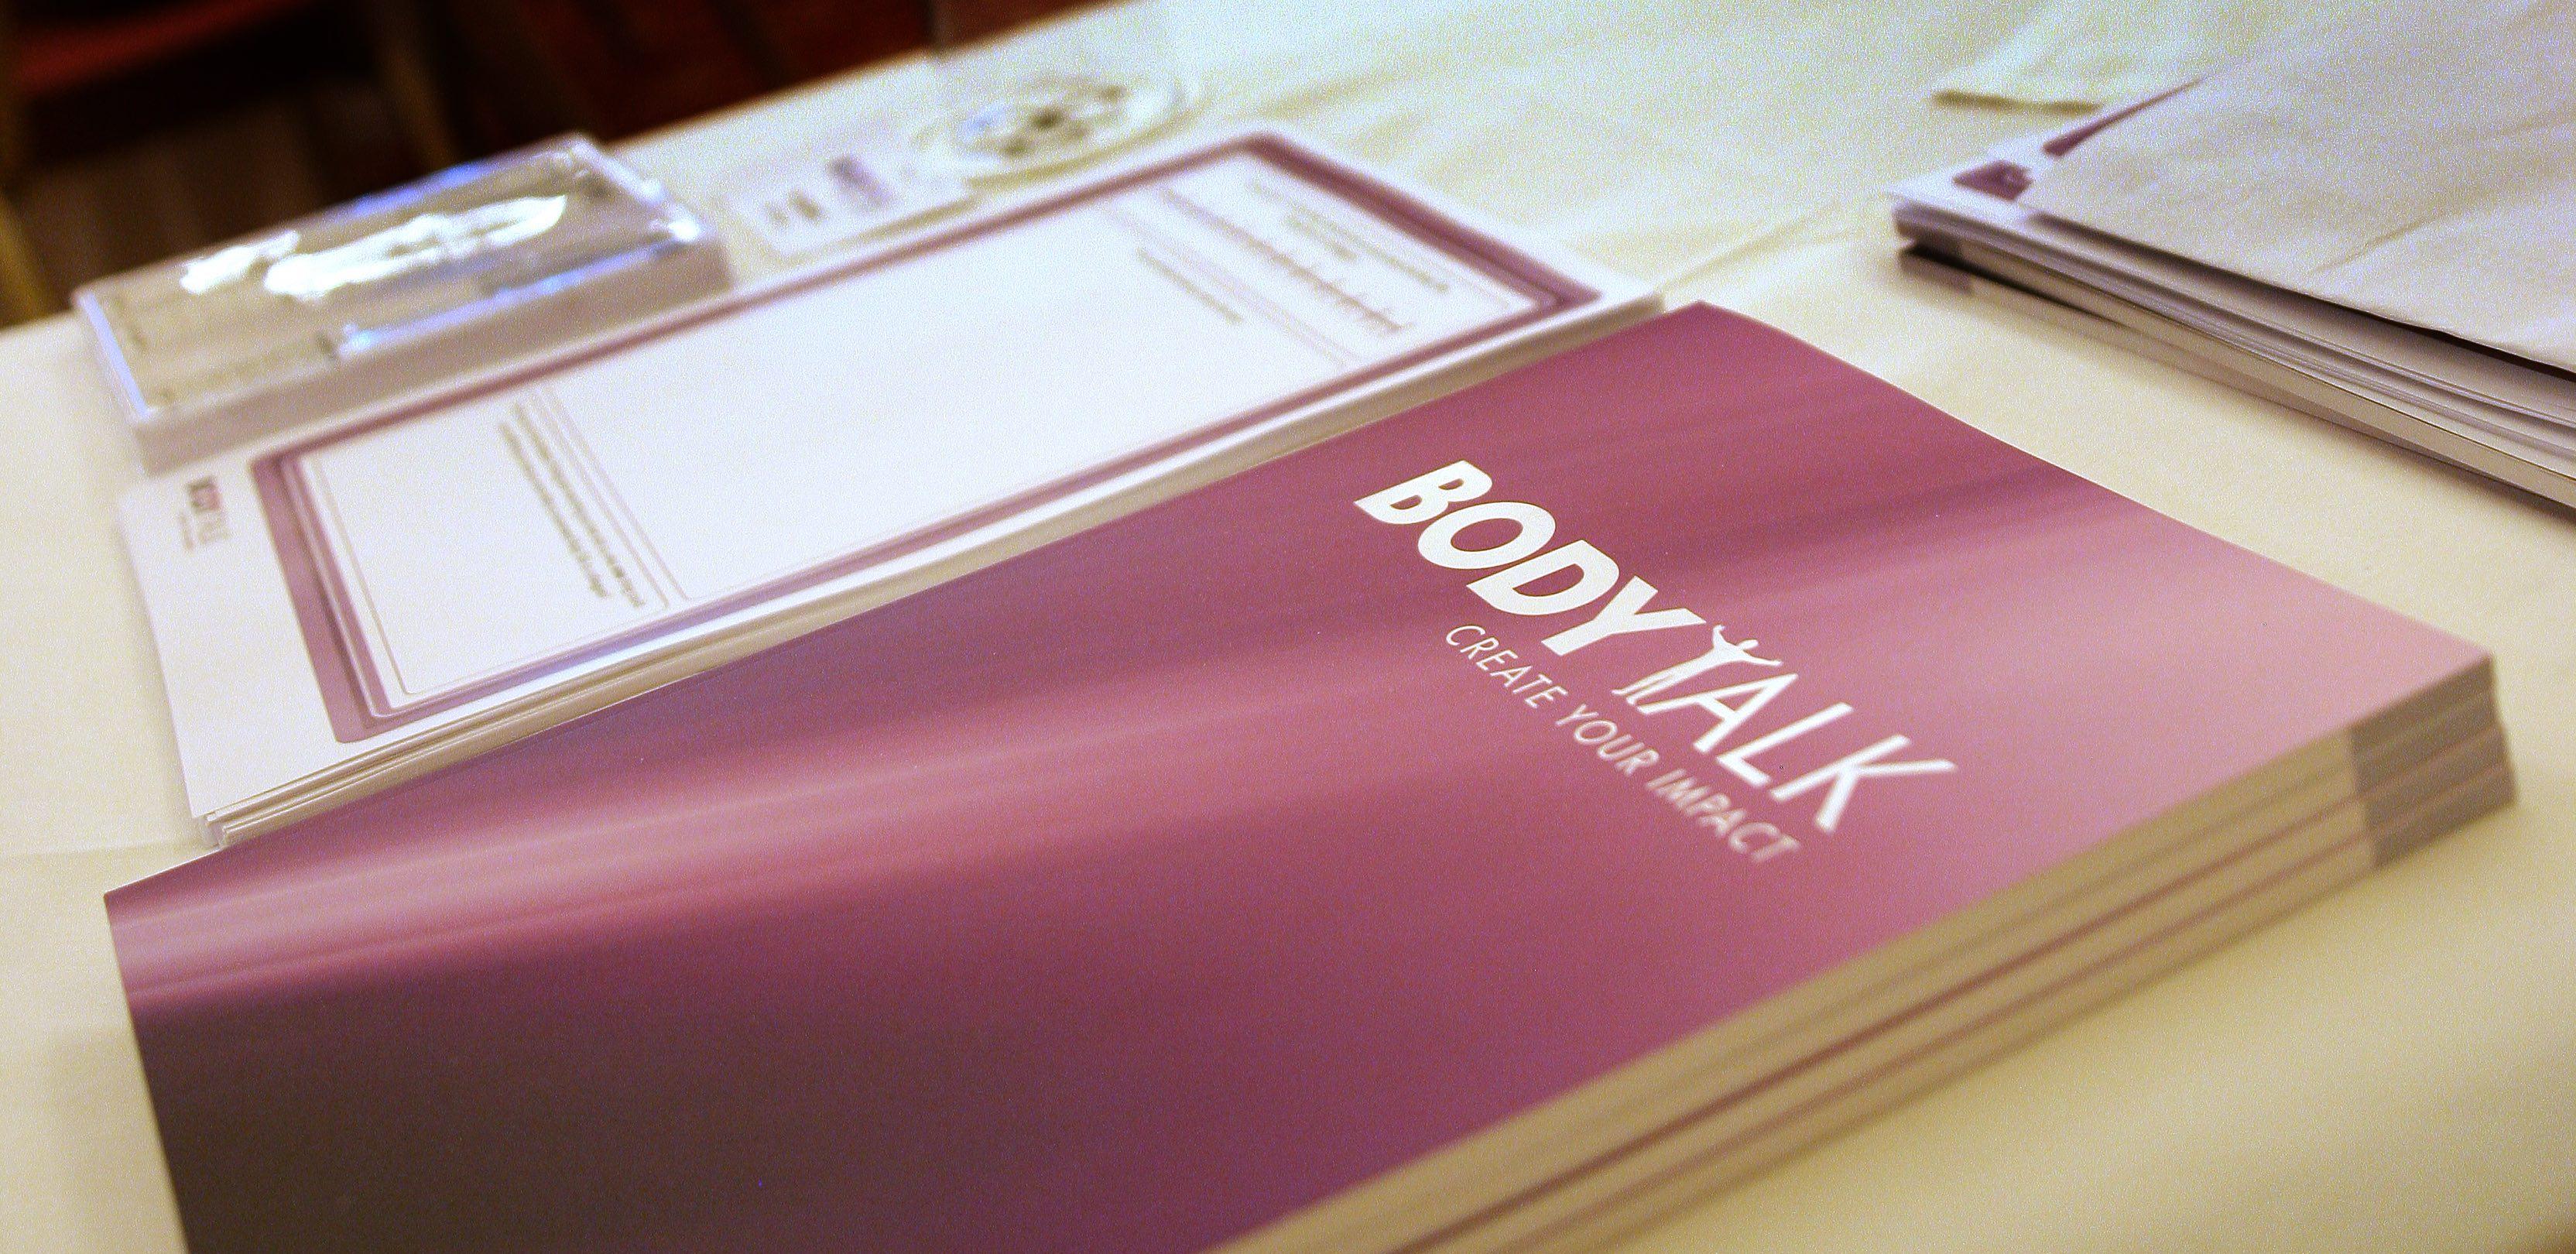 Bodytalk free master-class book